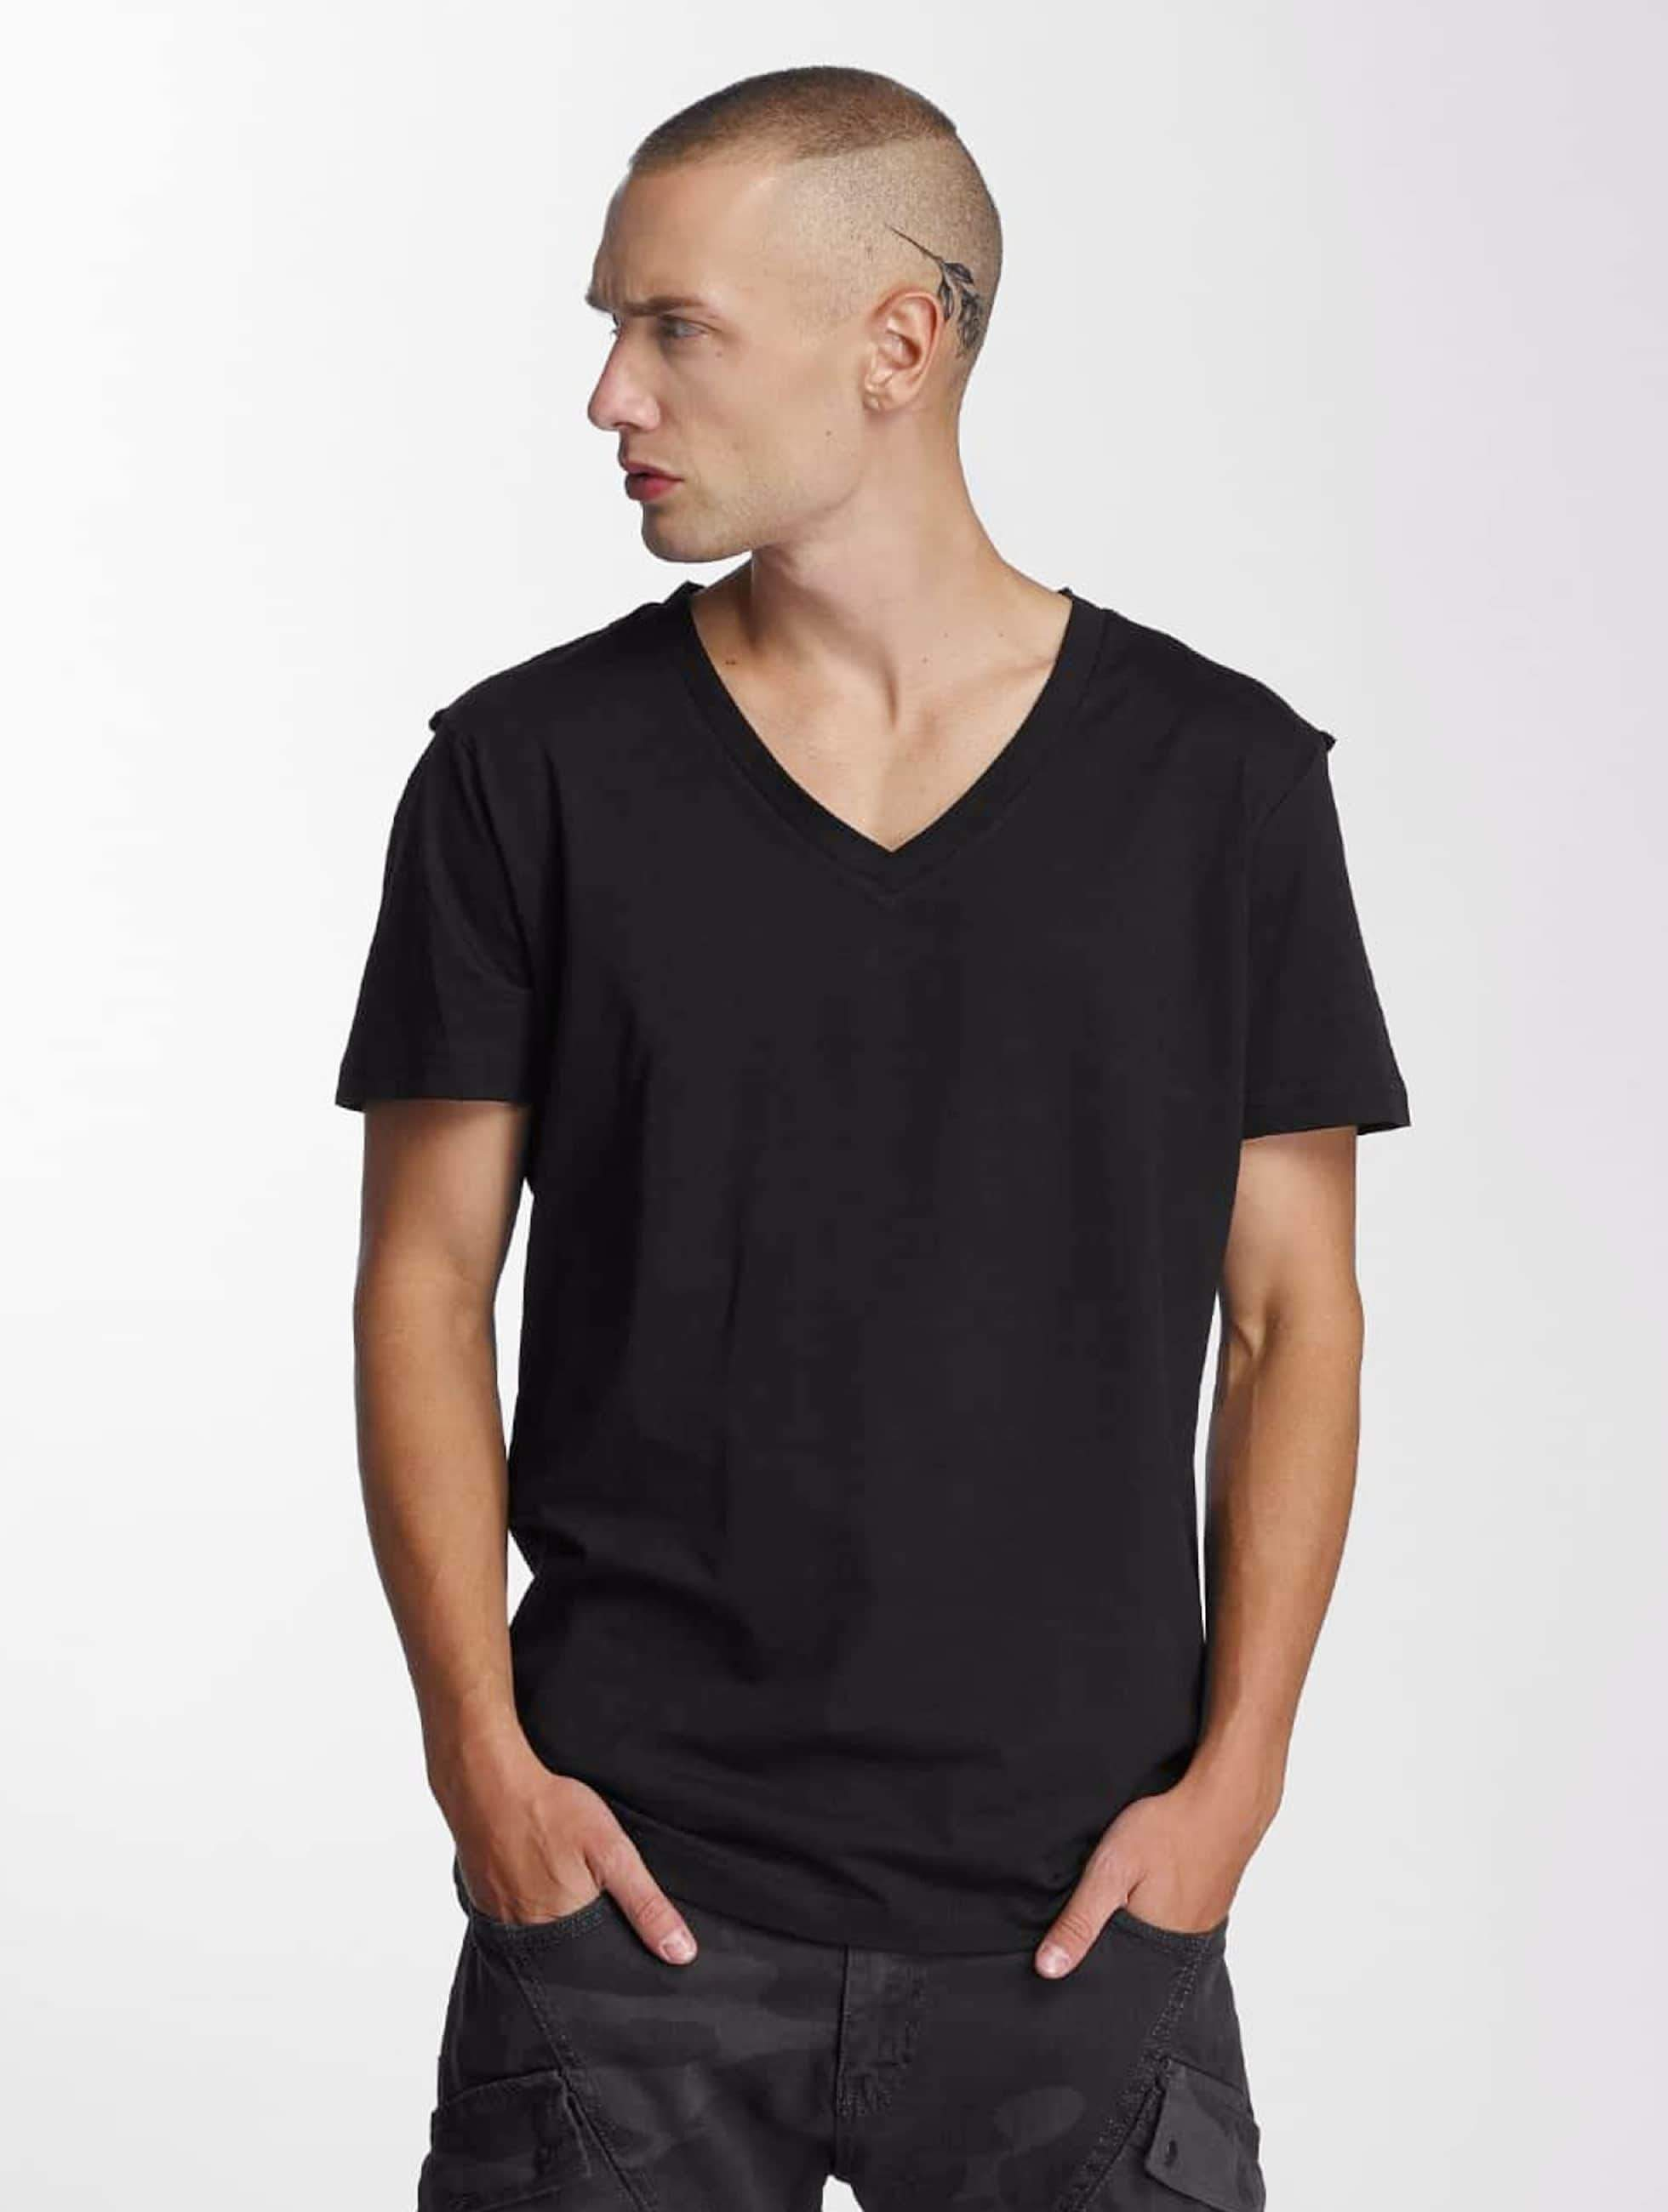 Bangastic / T-Shirt V-Neck in black S